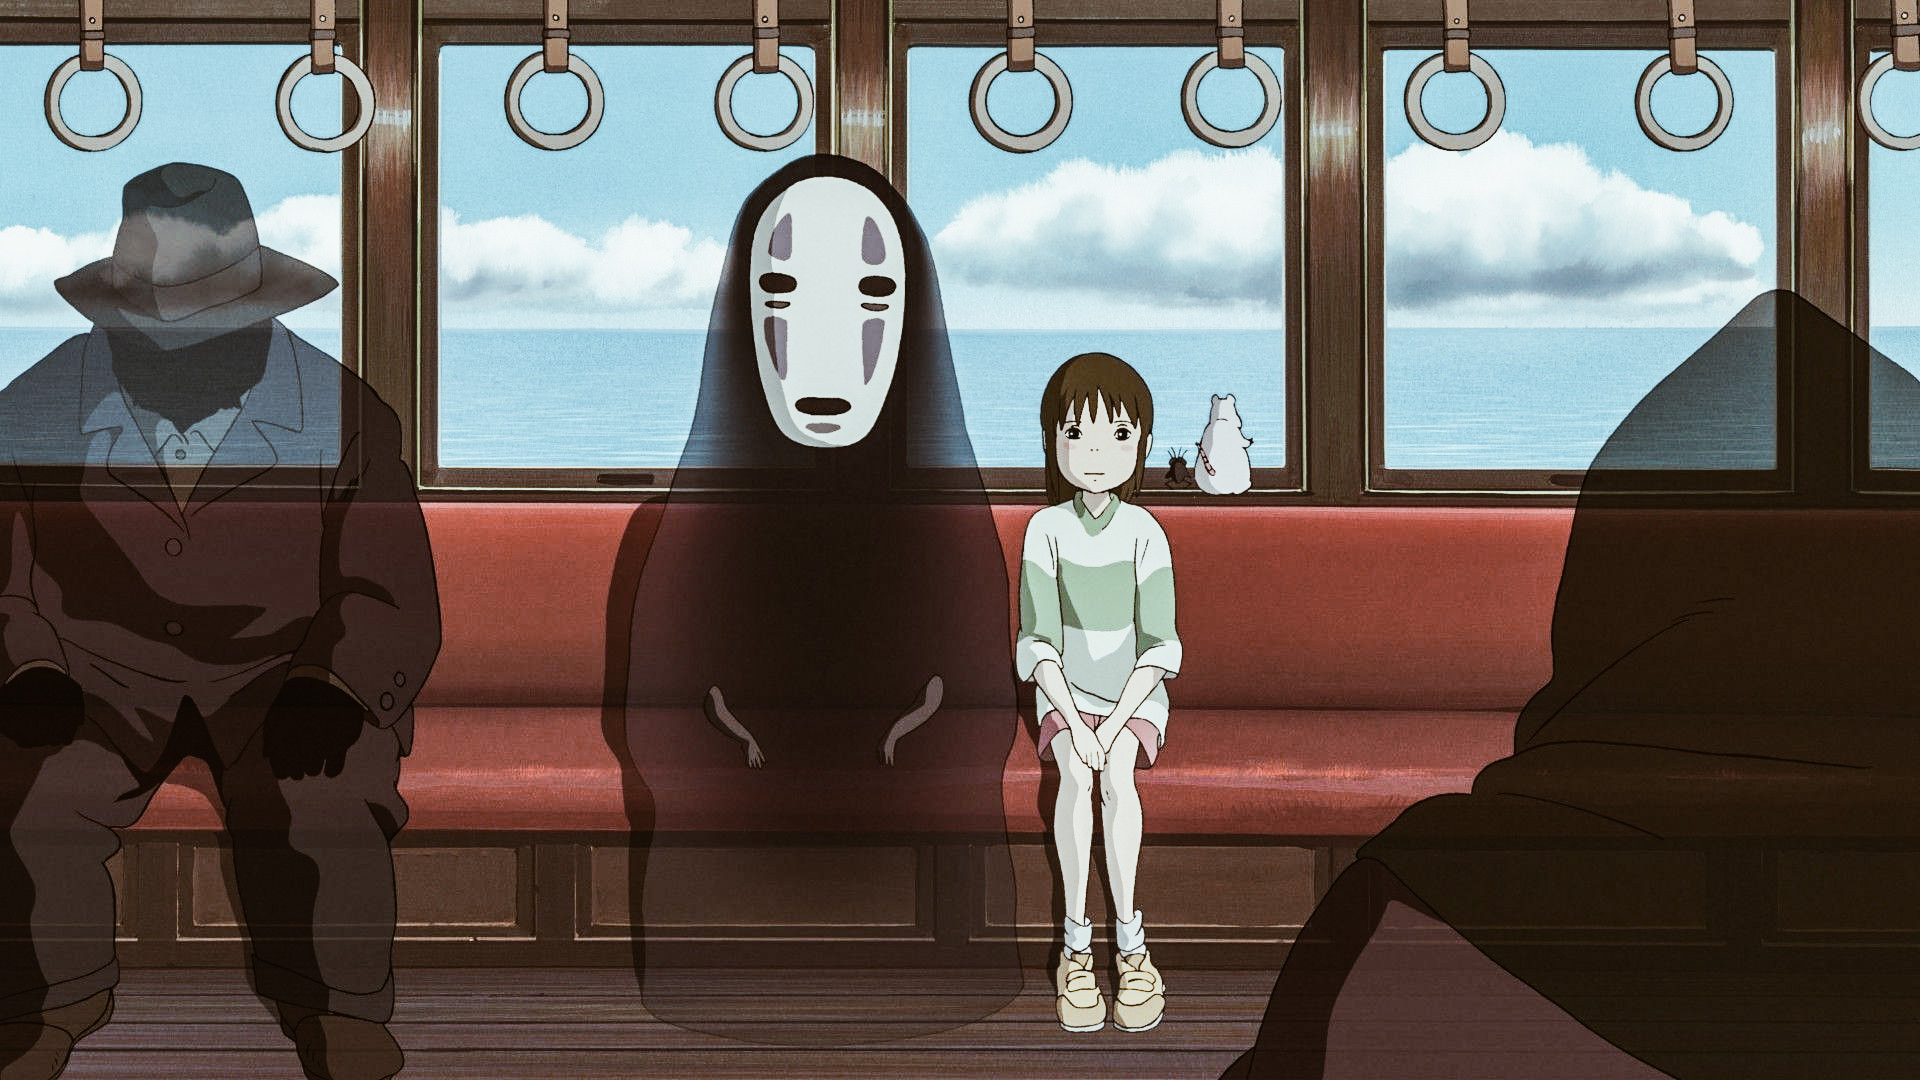 TENOHA Ghibli